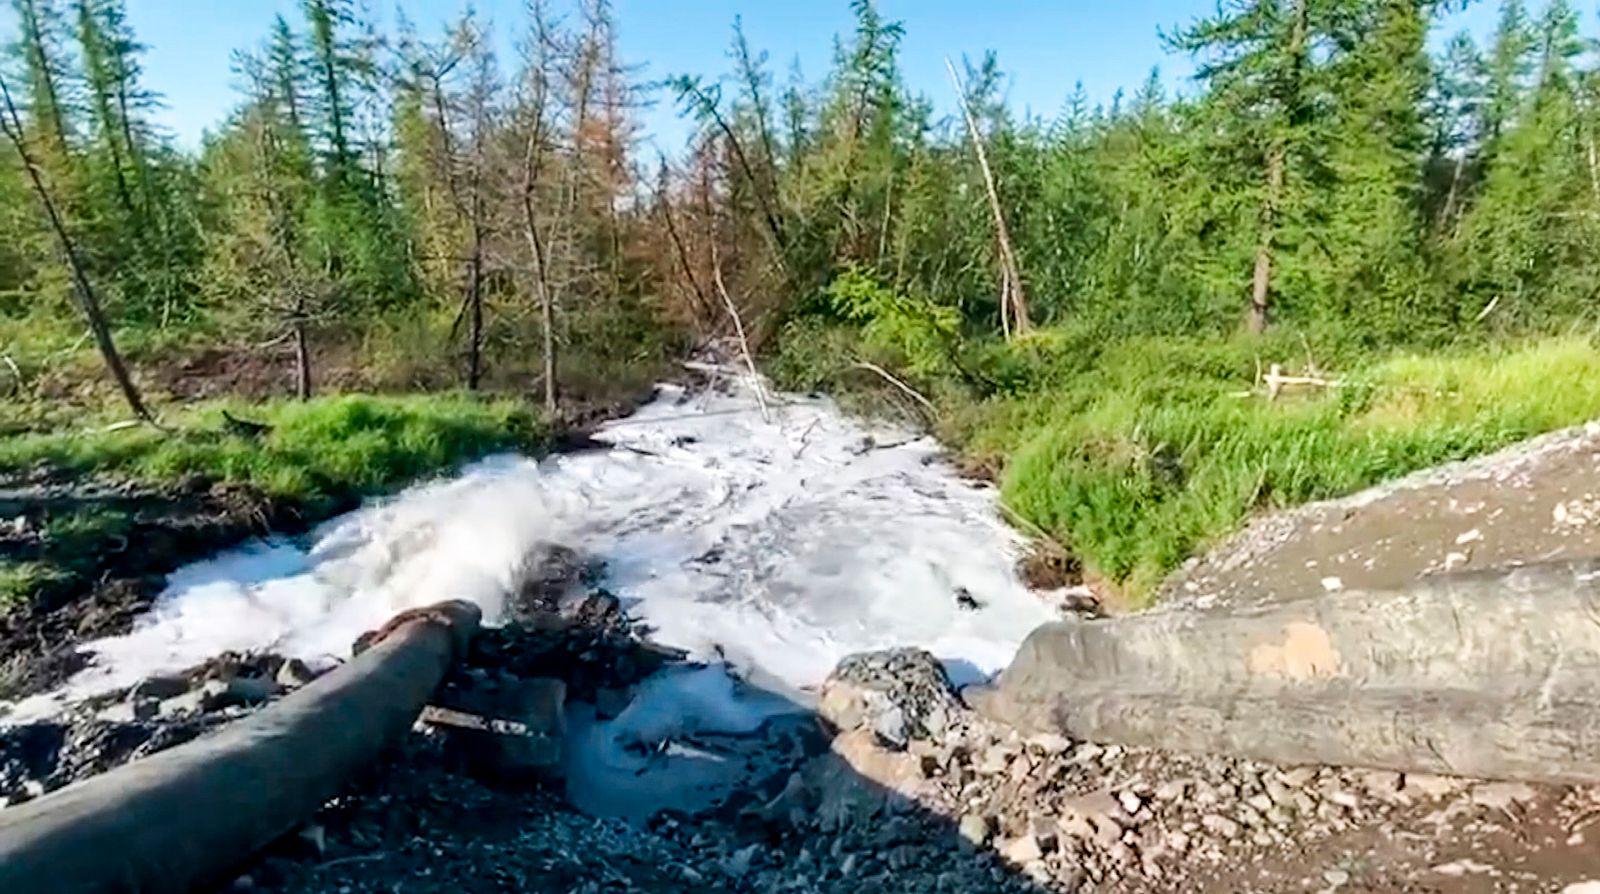 Neuer Umweltskandal in russischer Tundra